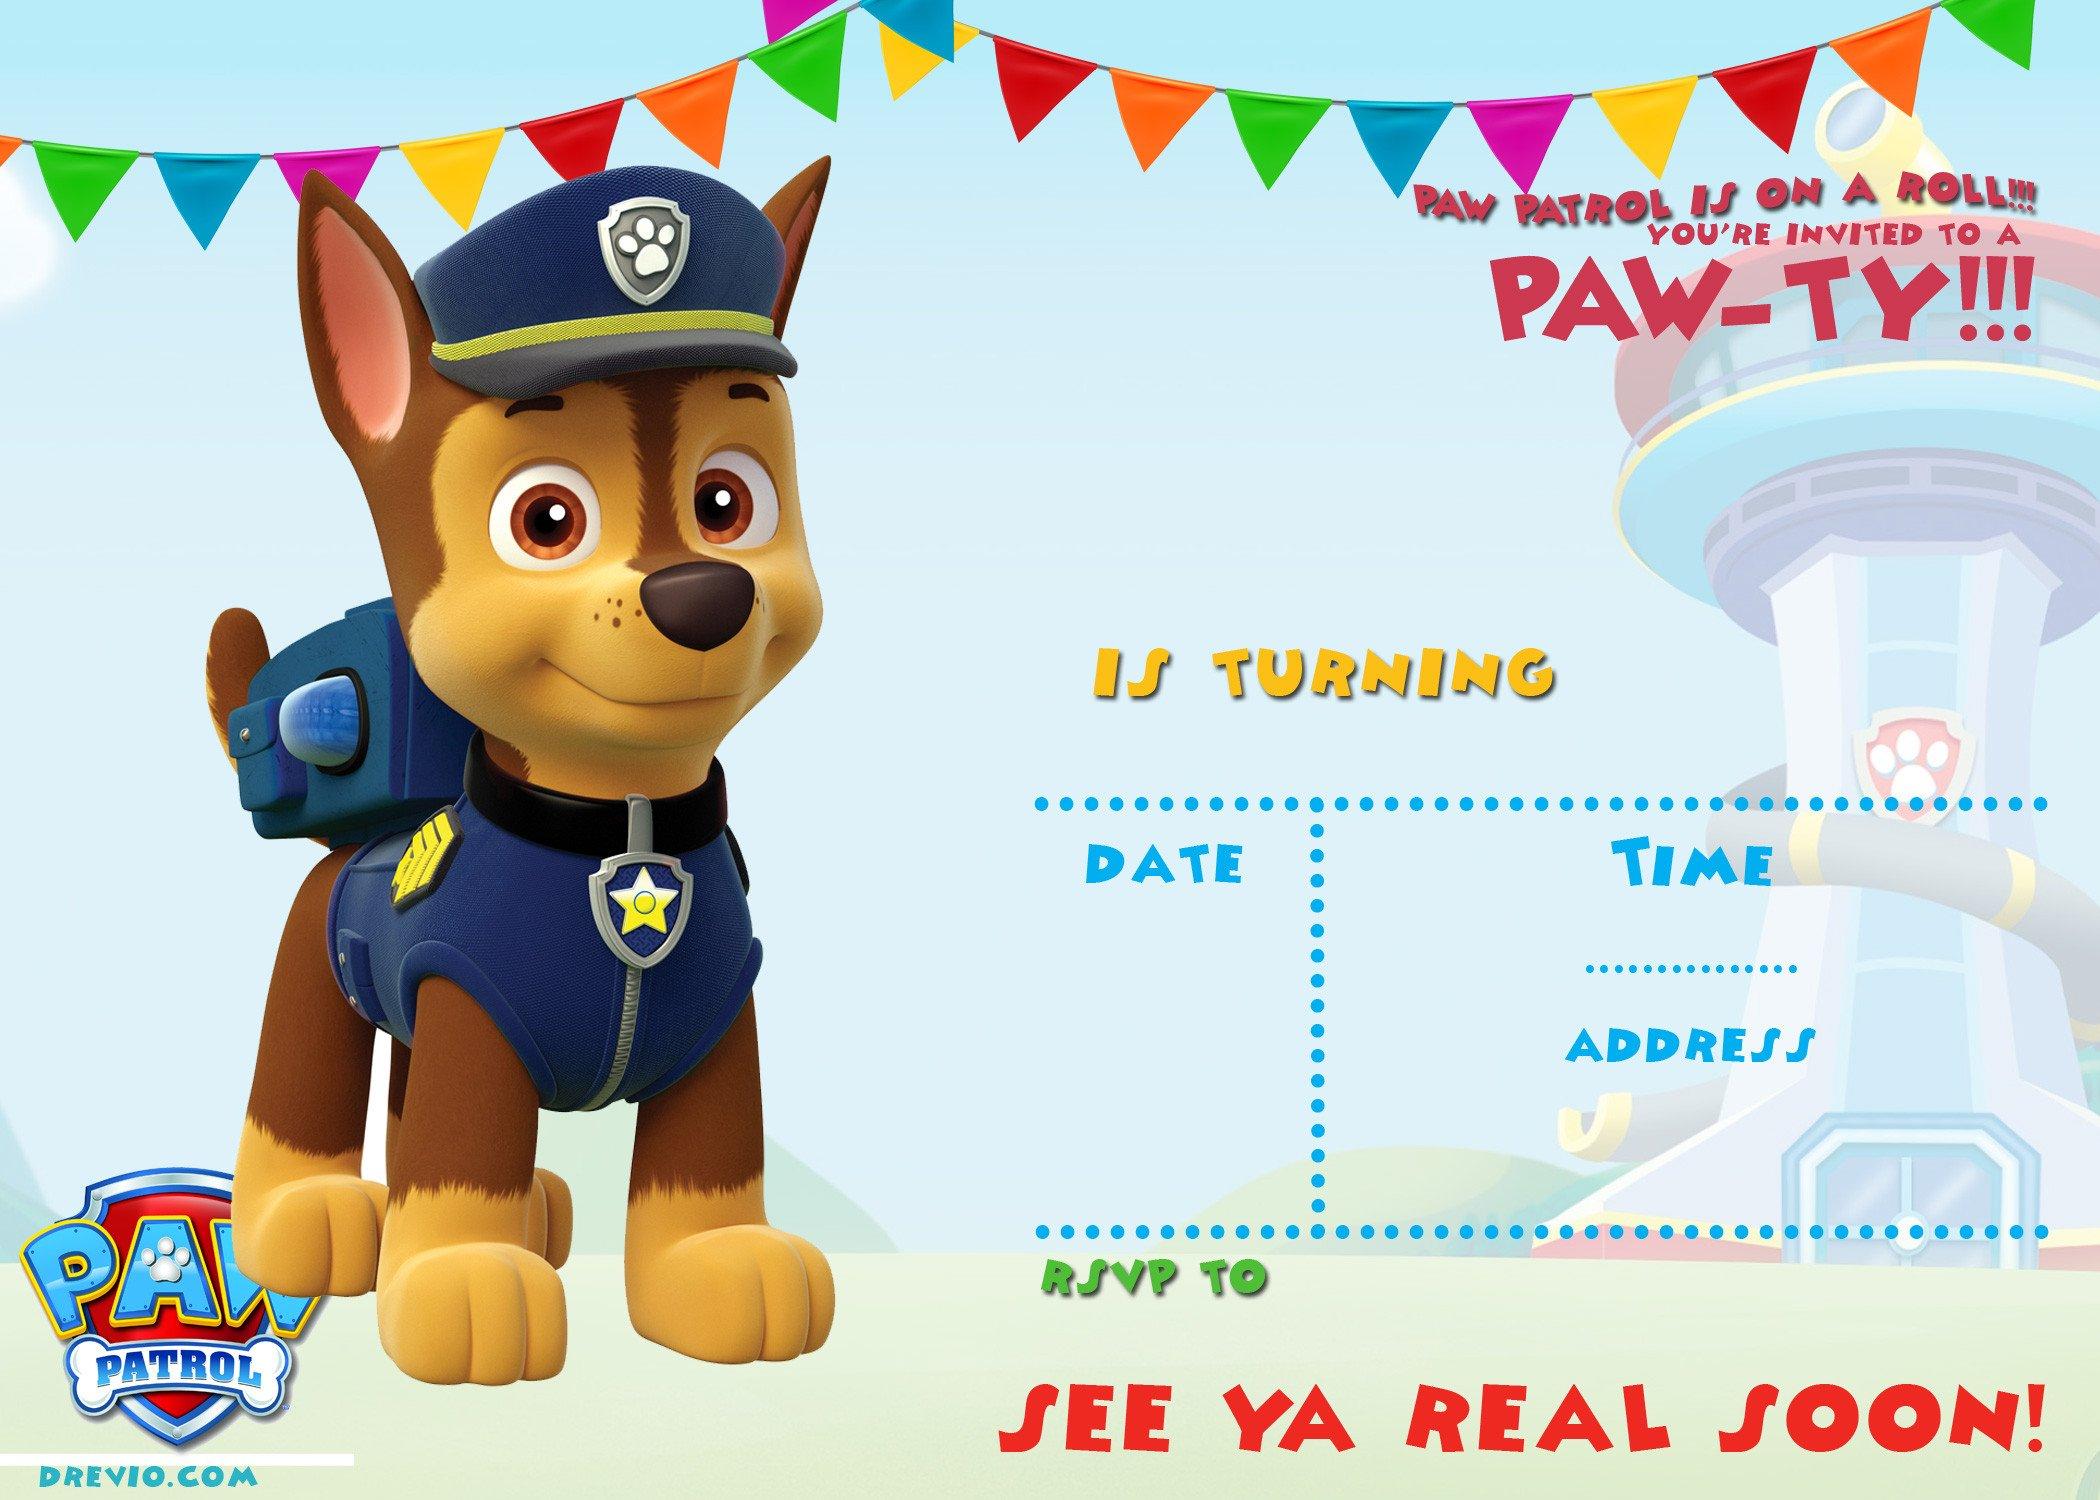 Paw Patrol Invitation Templates Free Printable Paw Patrol Birthday Invitation Ideas